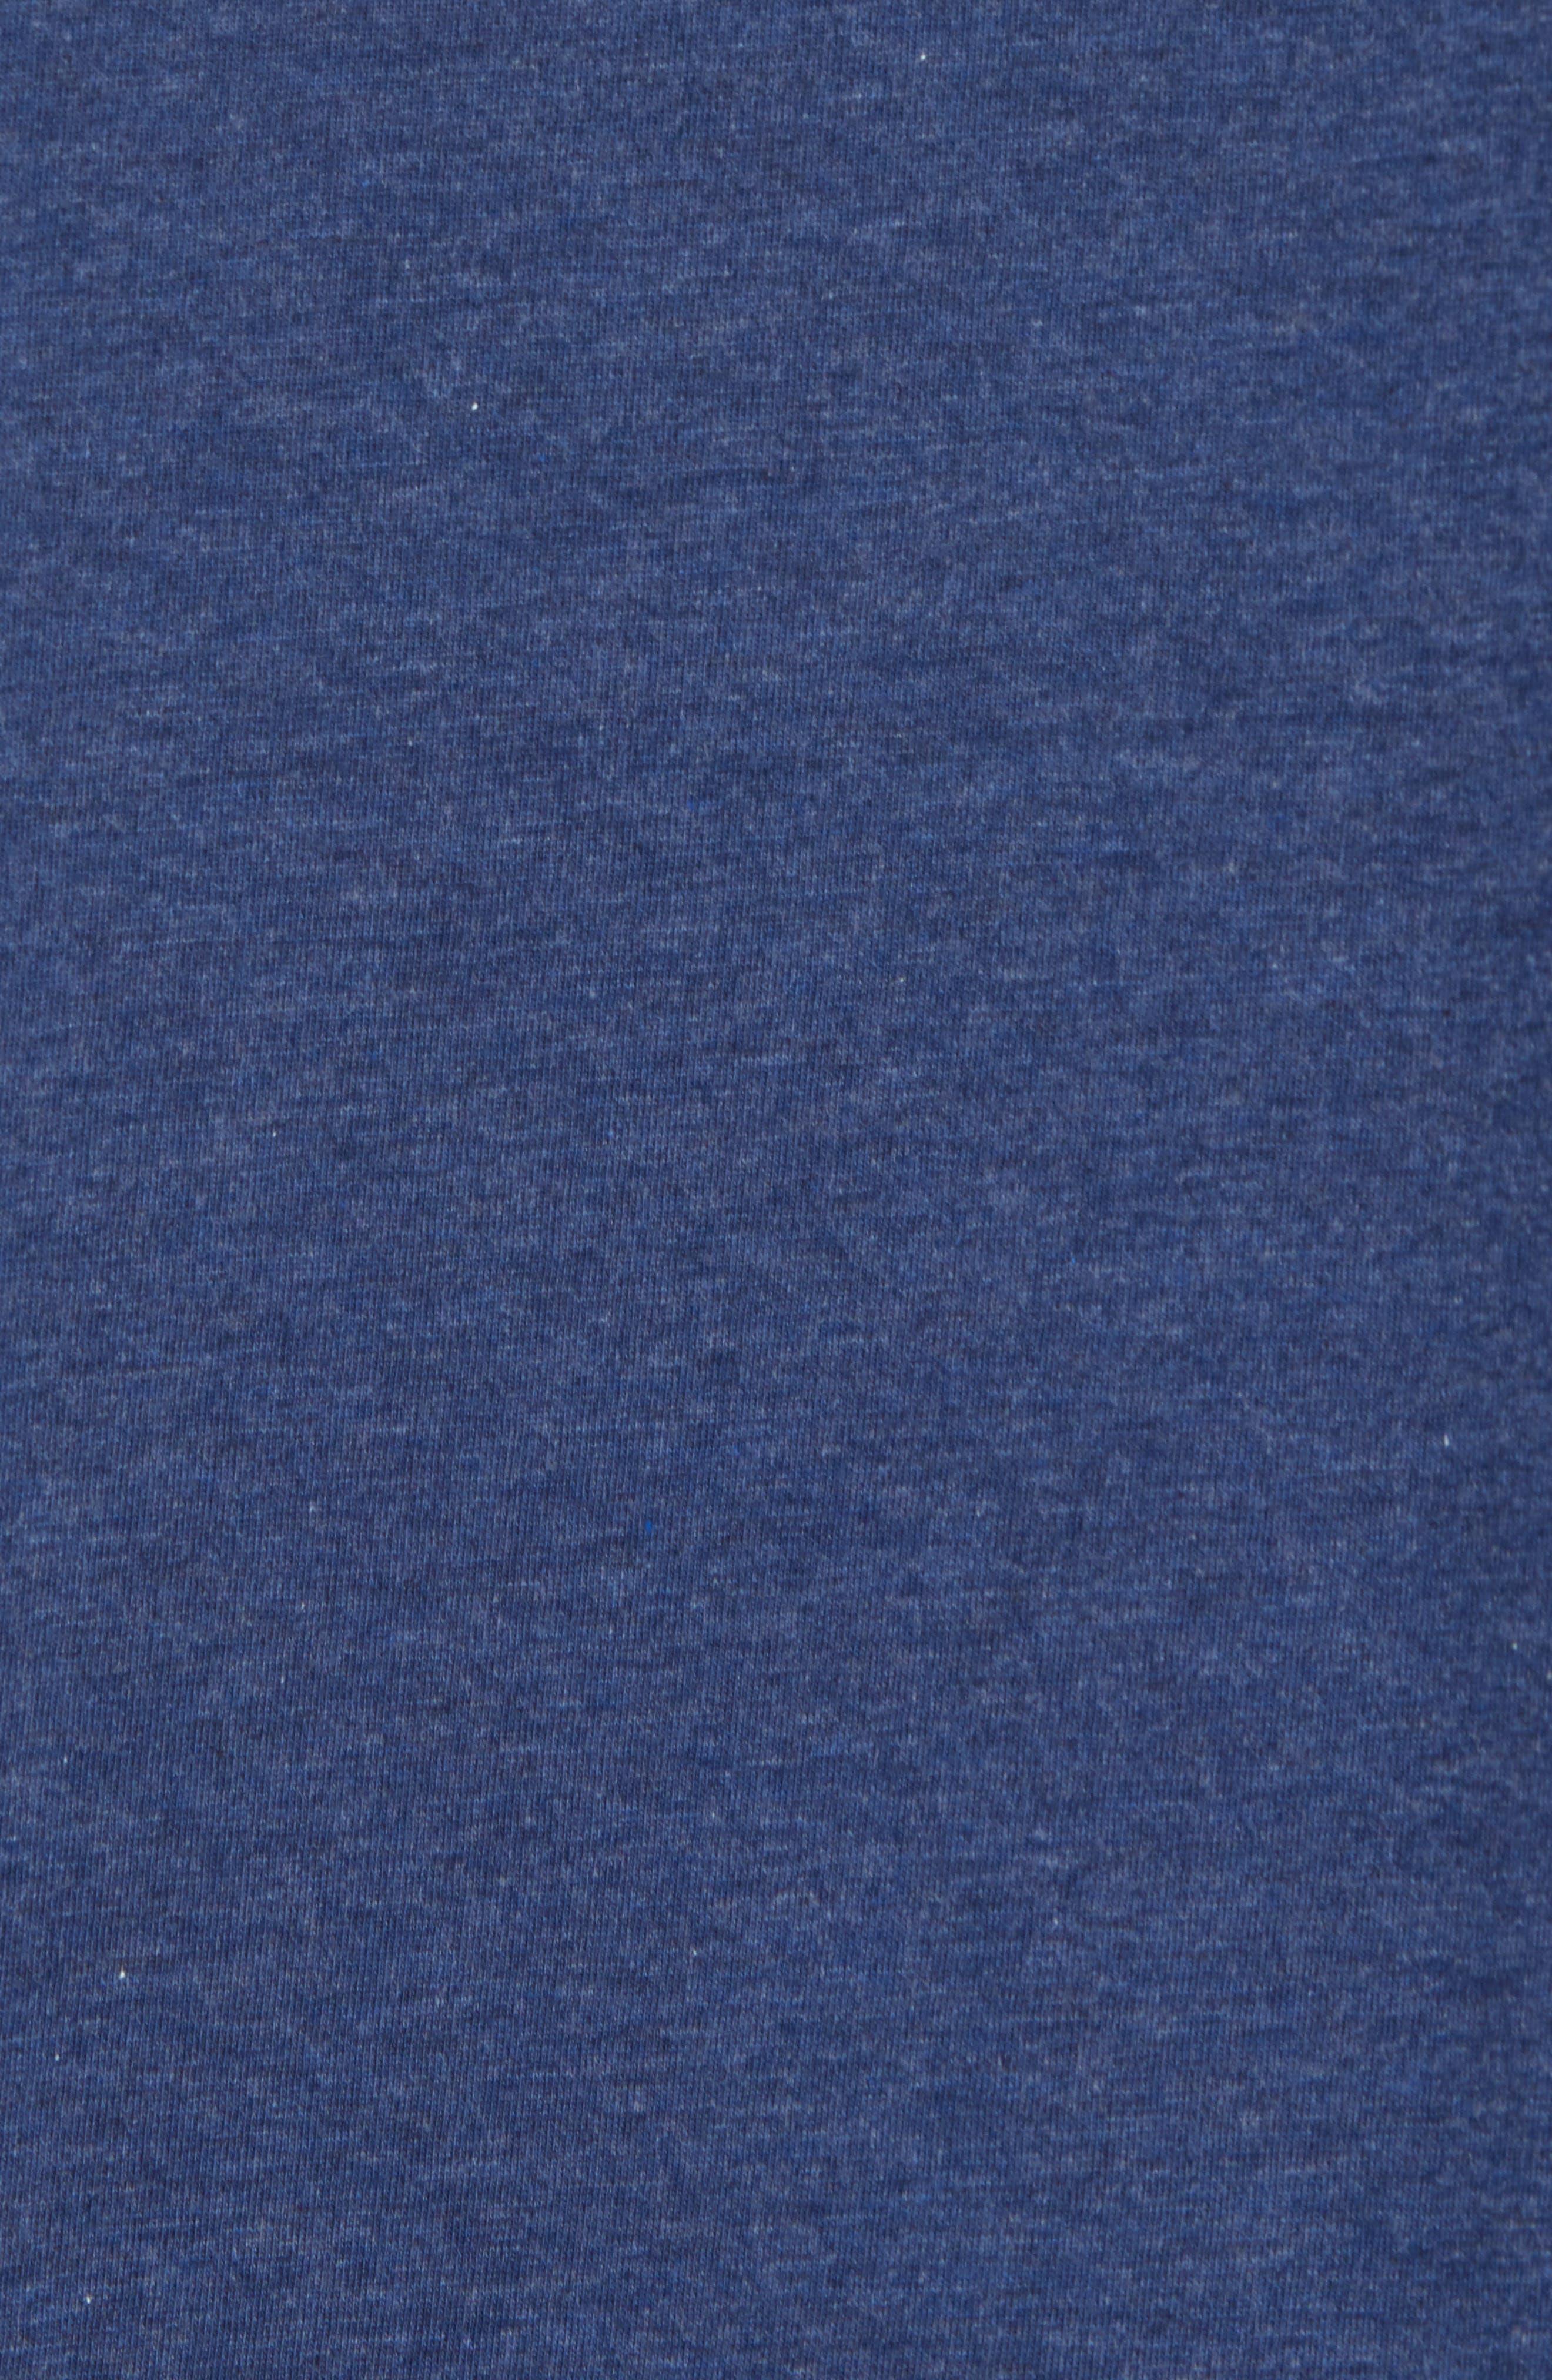 V-Neck Cotton T-Shirt,                             Alternate thumbnail 20, color,